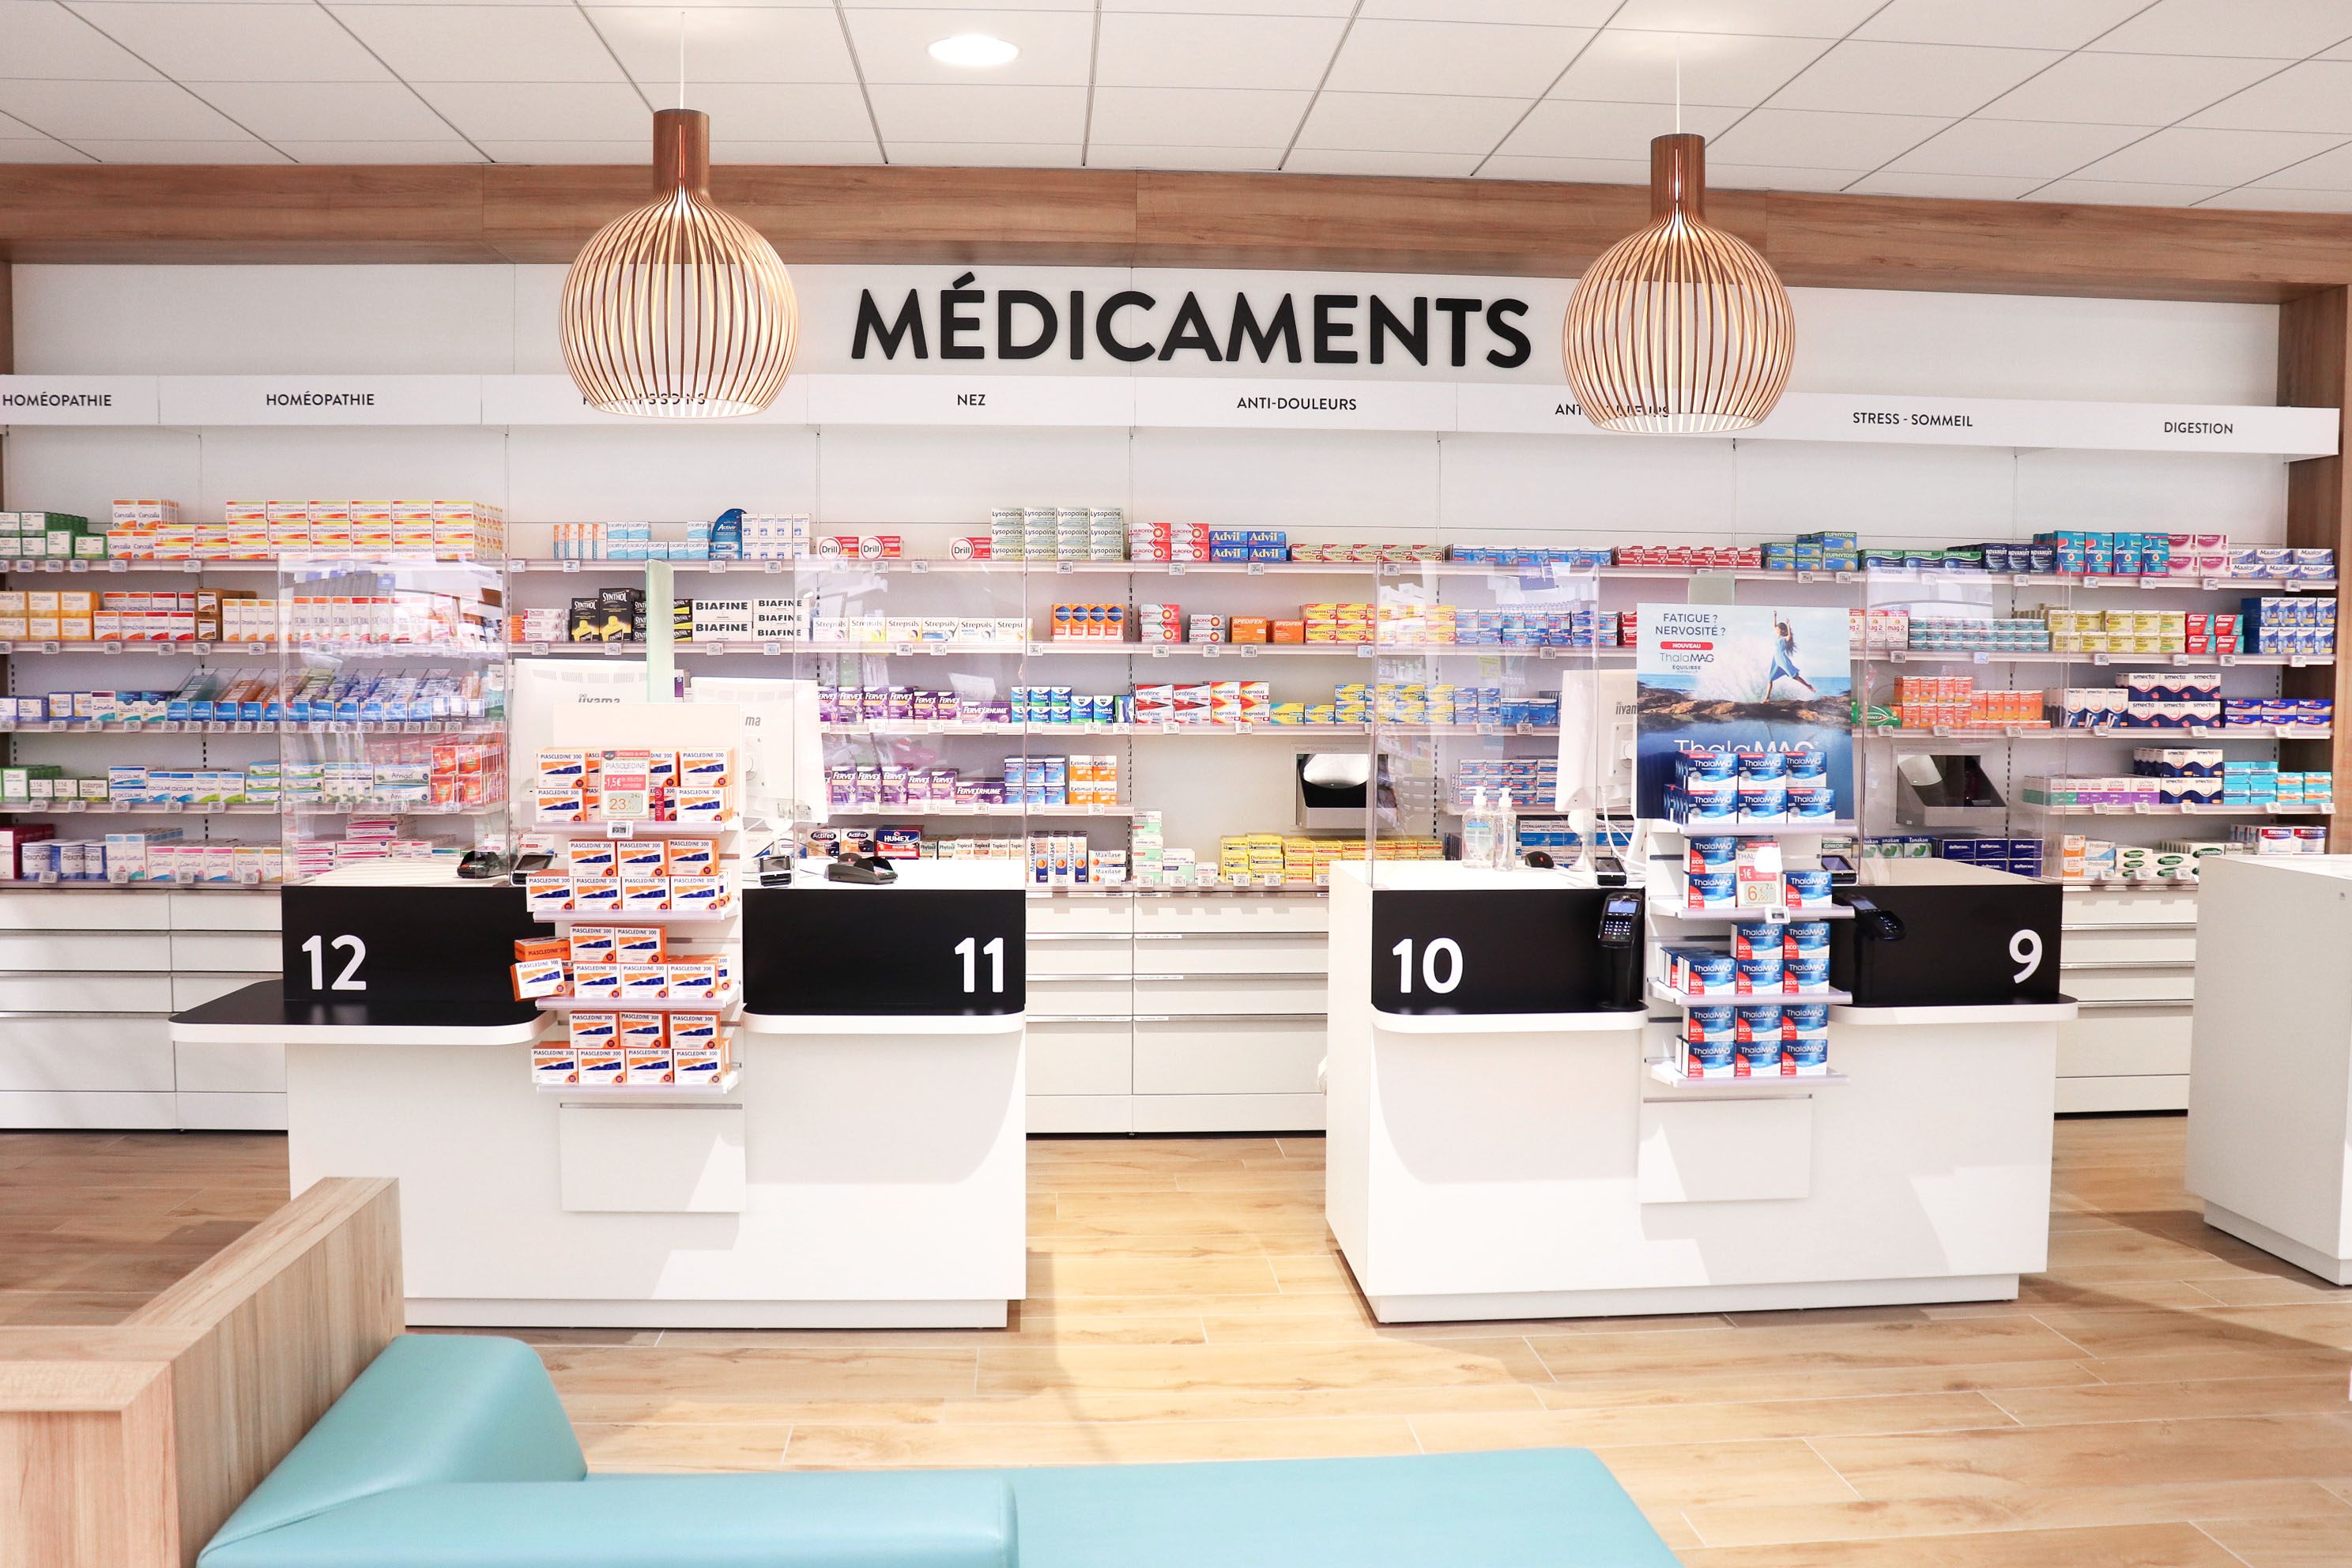 Agencement de pharmacie Mobil M